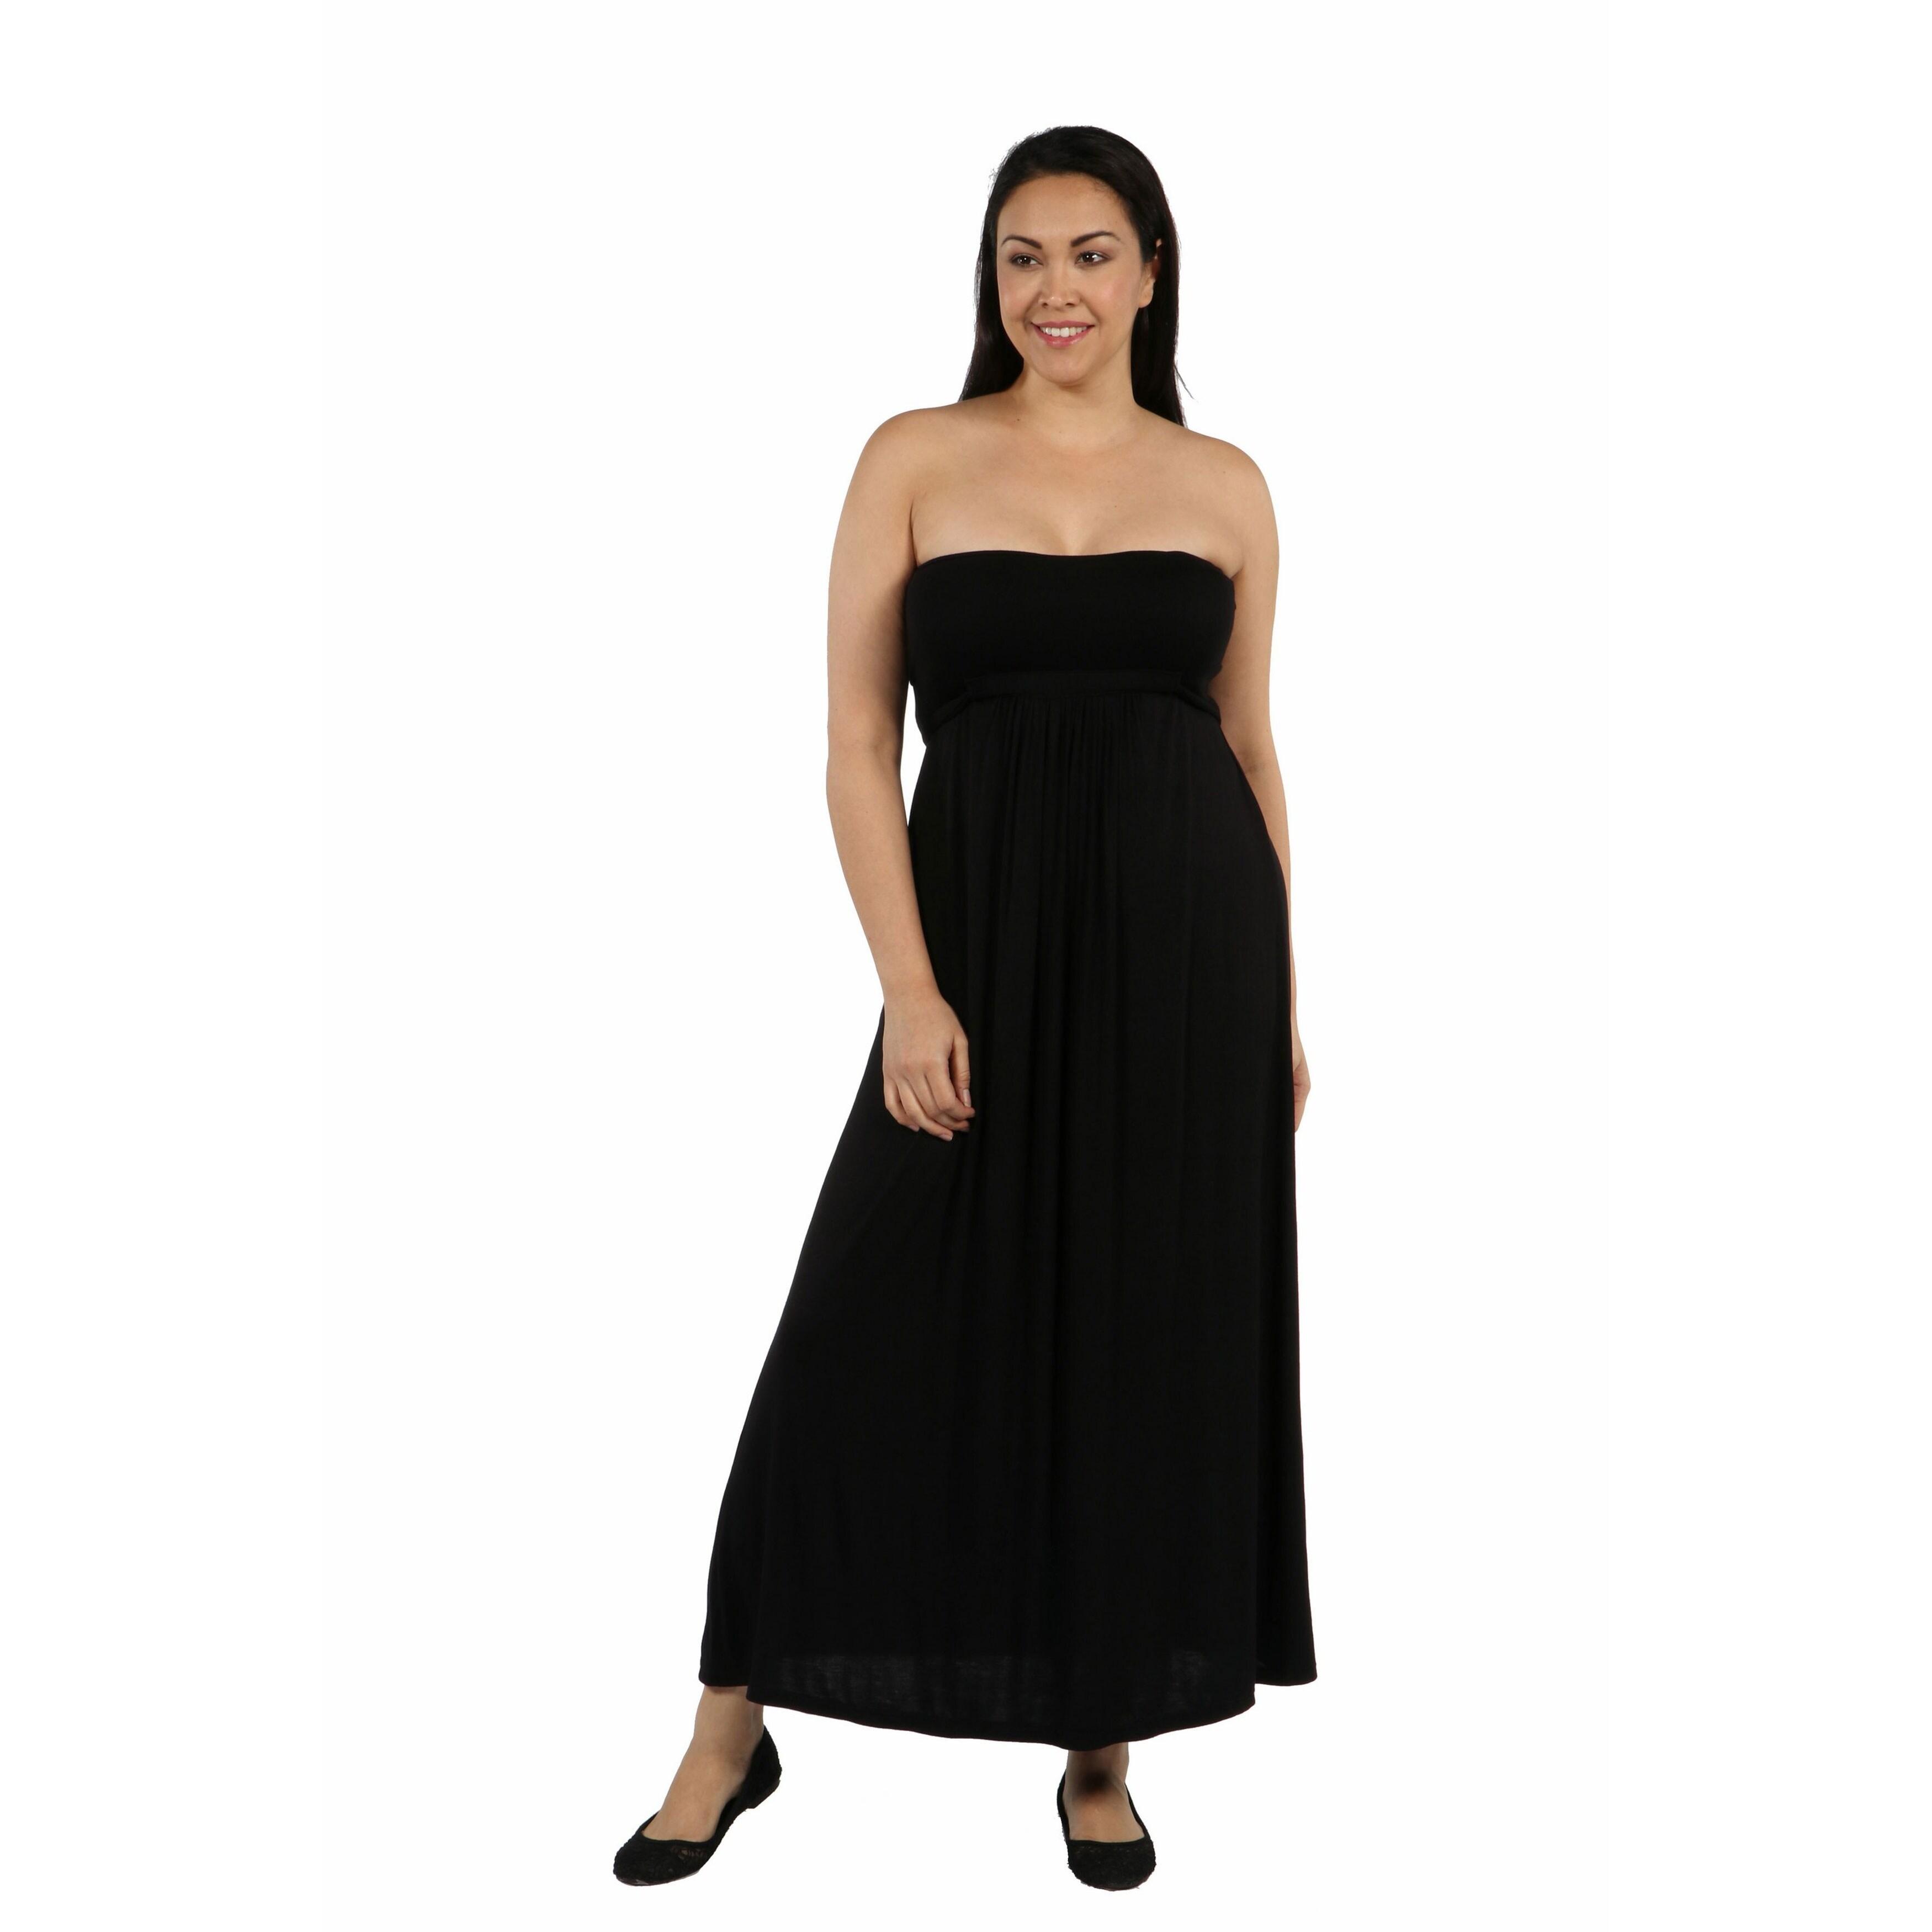 24seven Comfort Apparel Belted Empire Waist Strapless Plus Size Maxi Dress